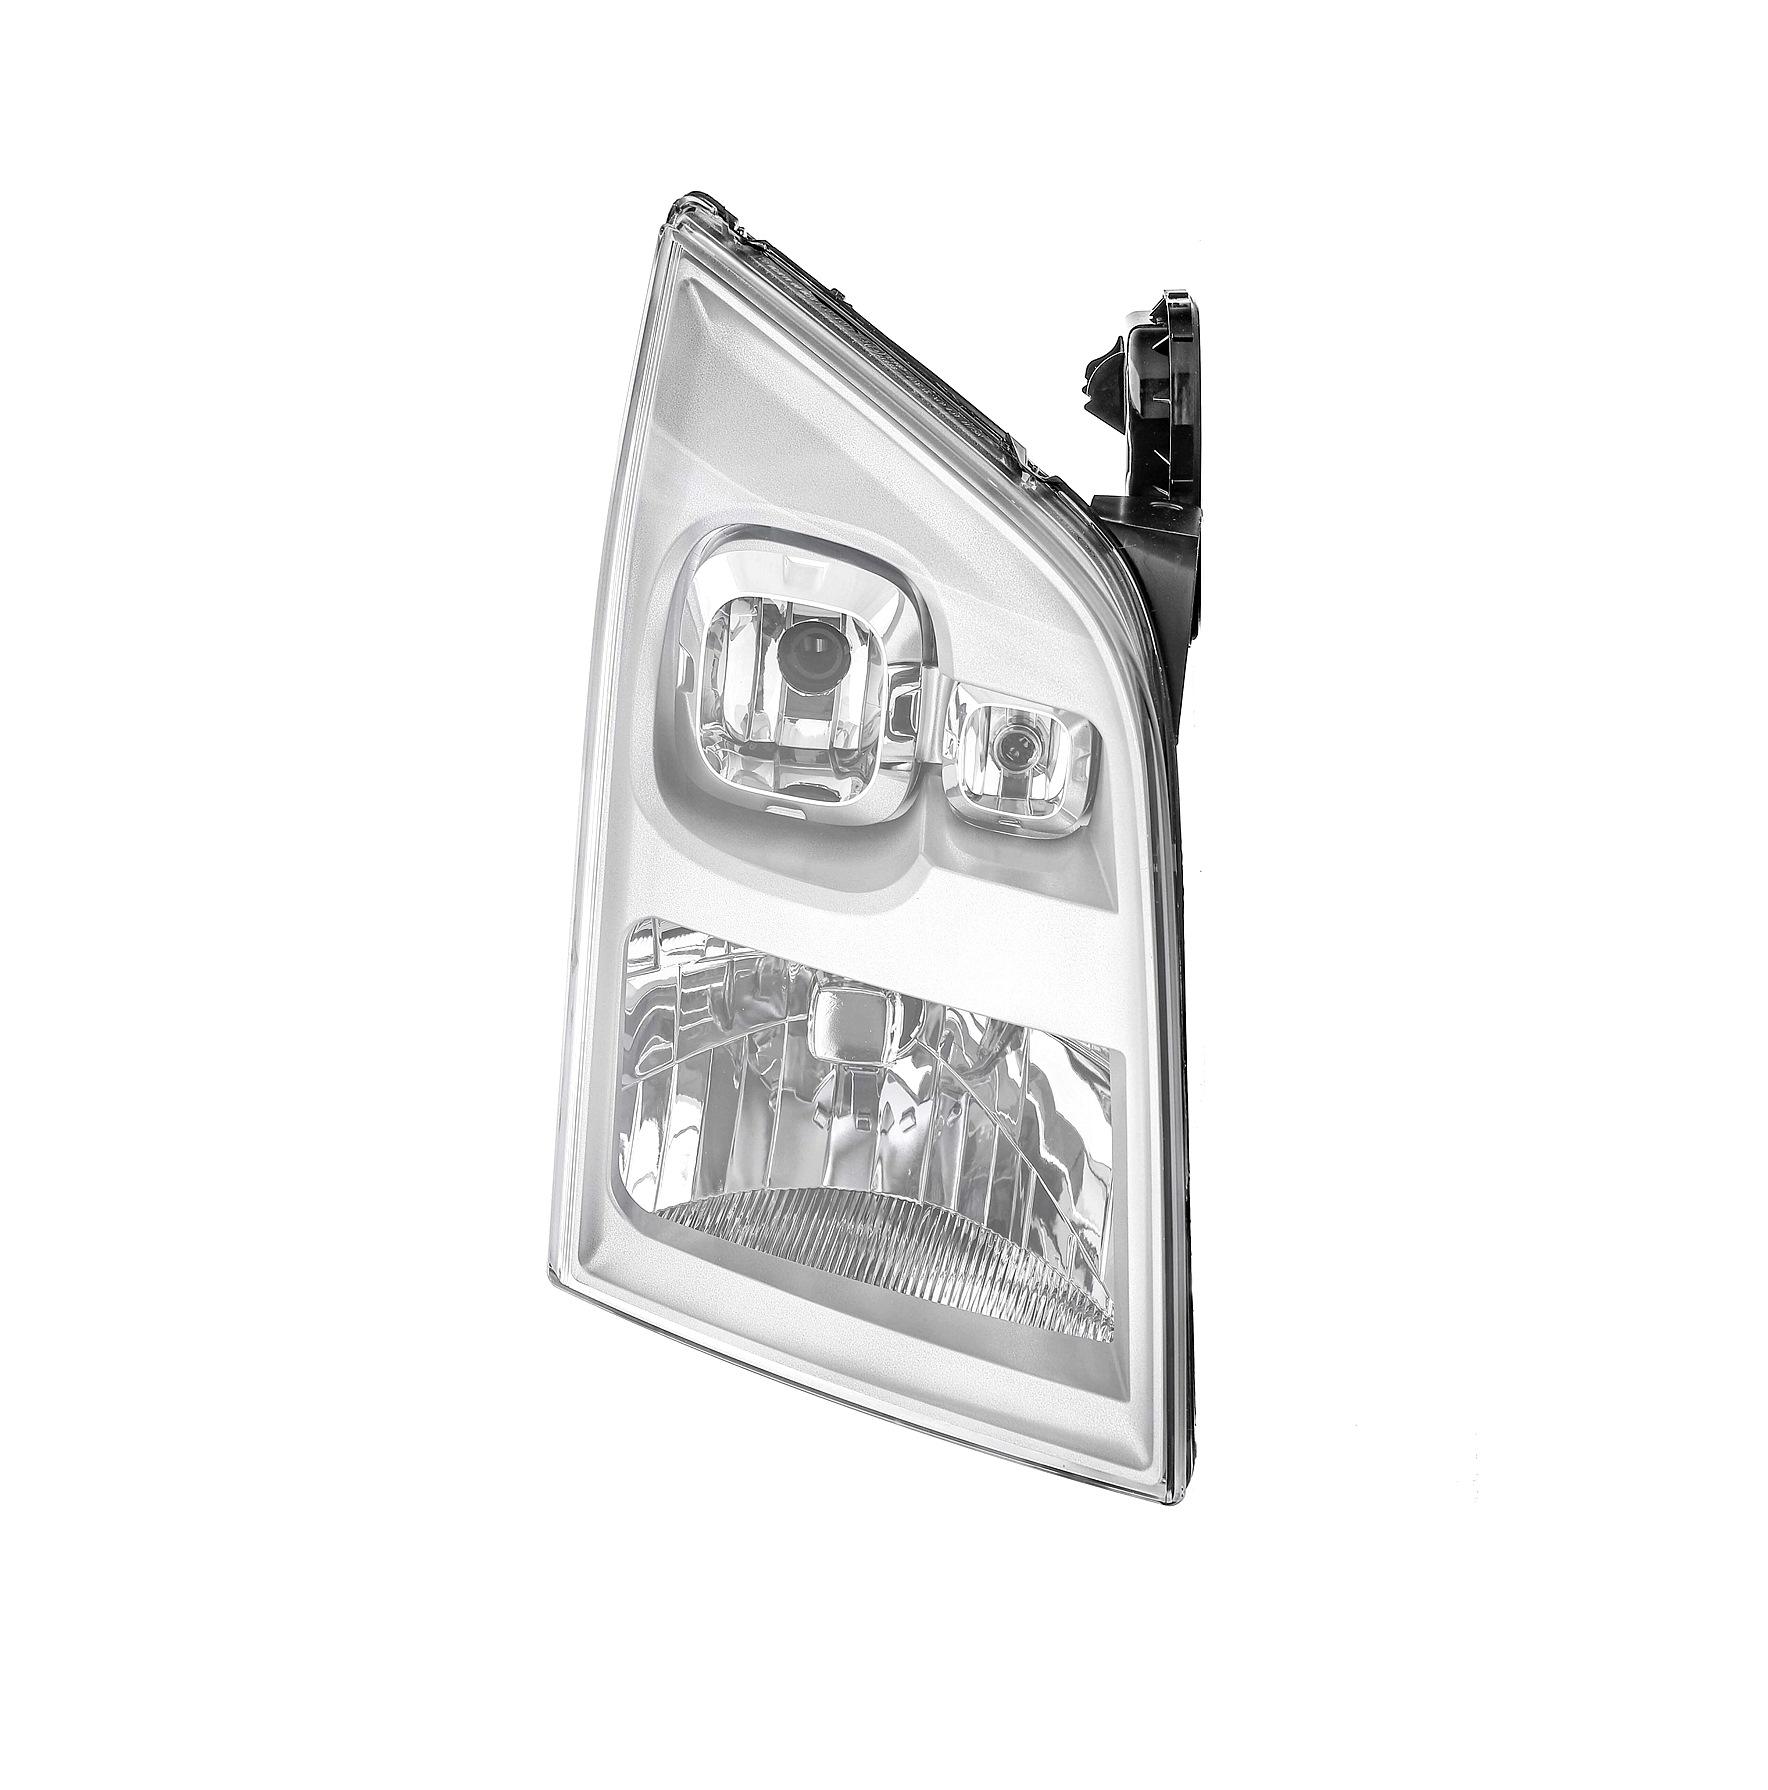 Buy original Headlights ABAKUS 431-1175R-LD-EM